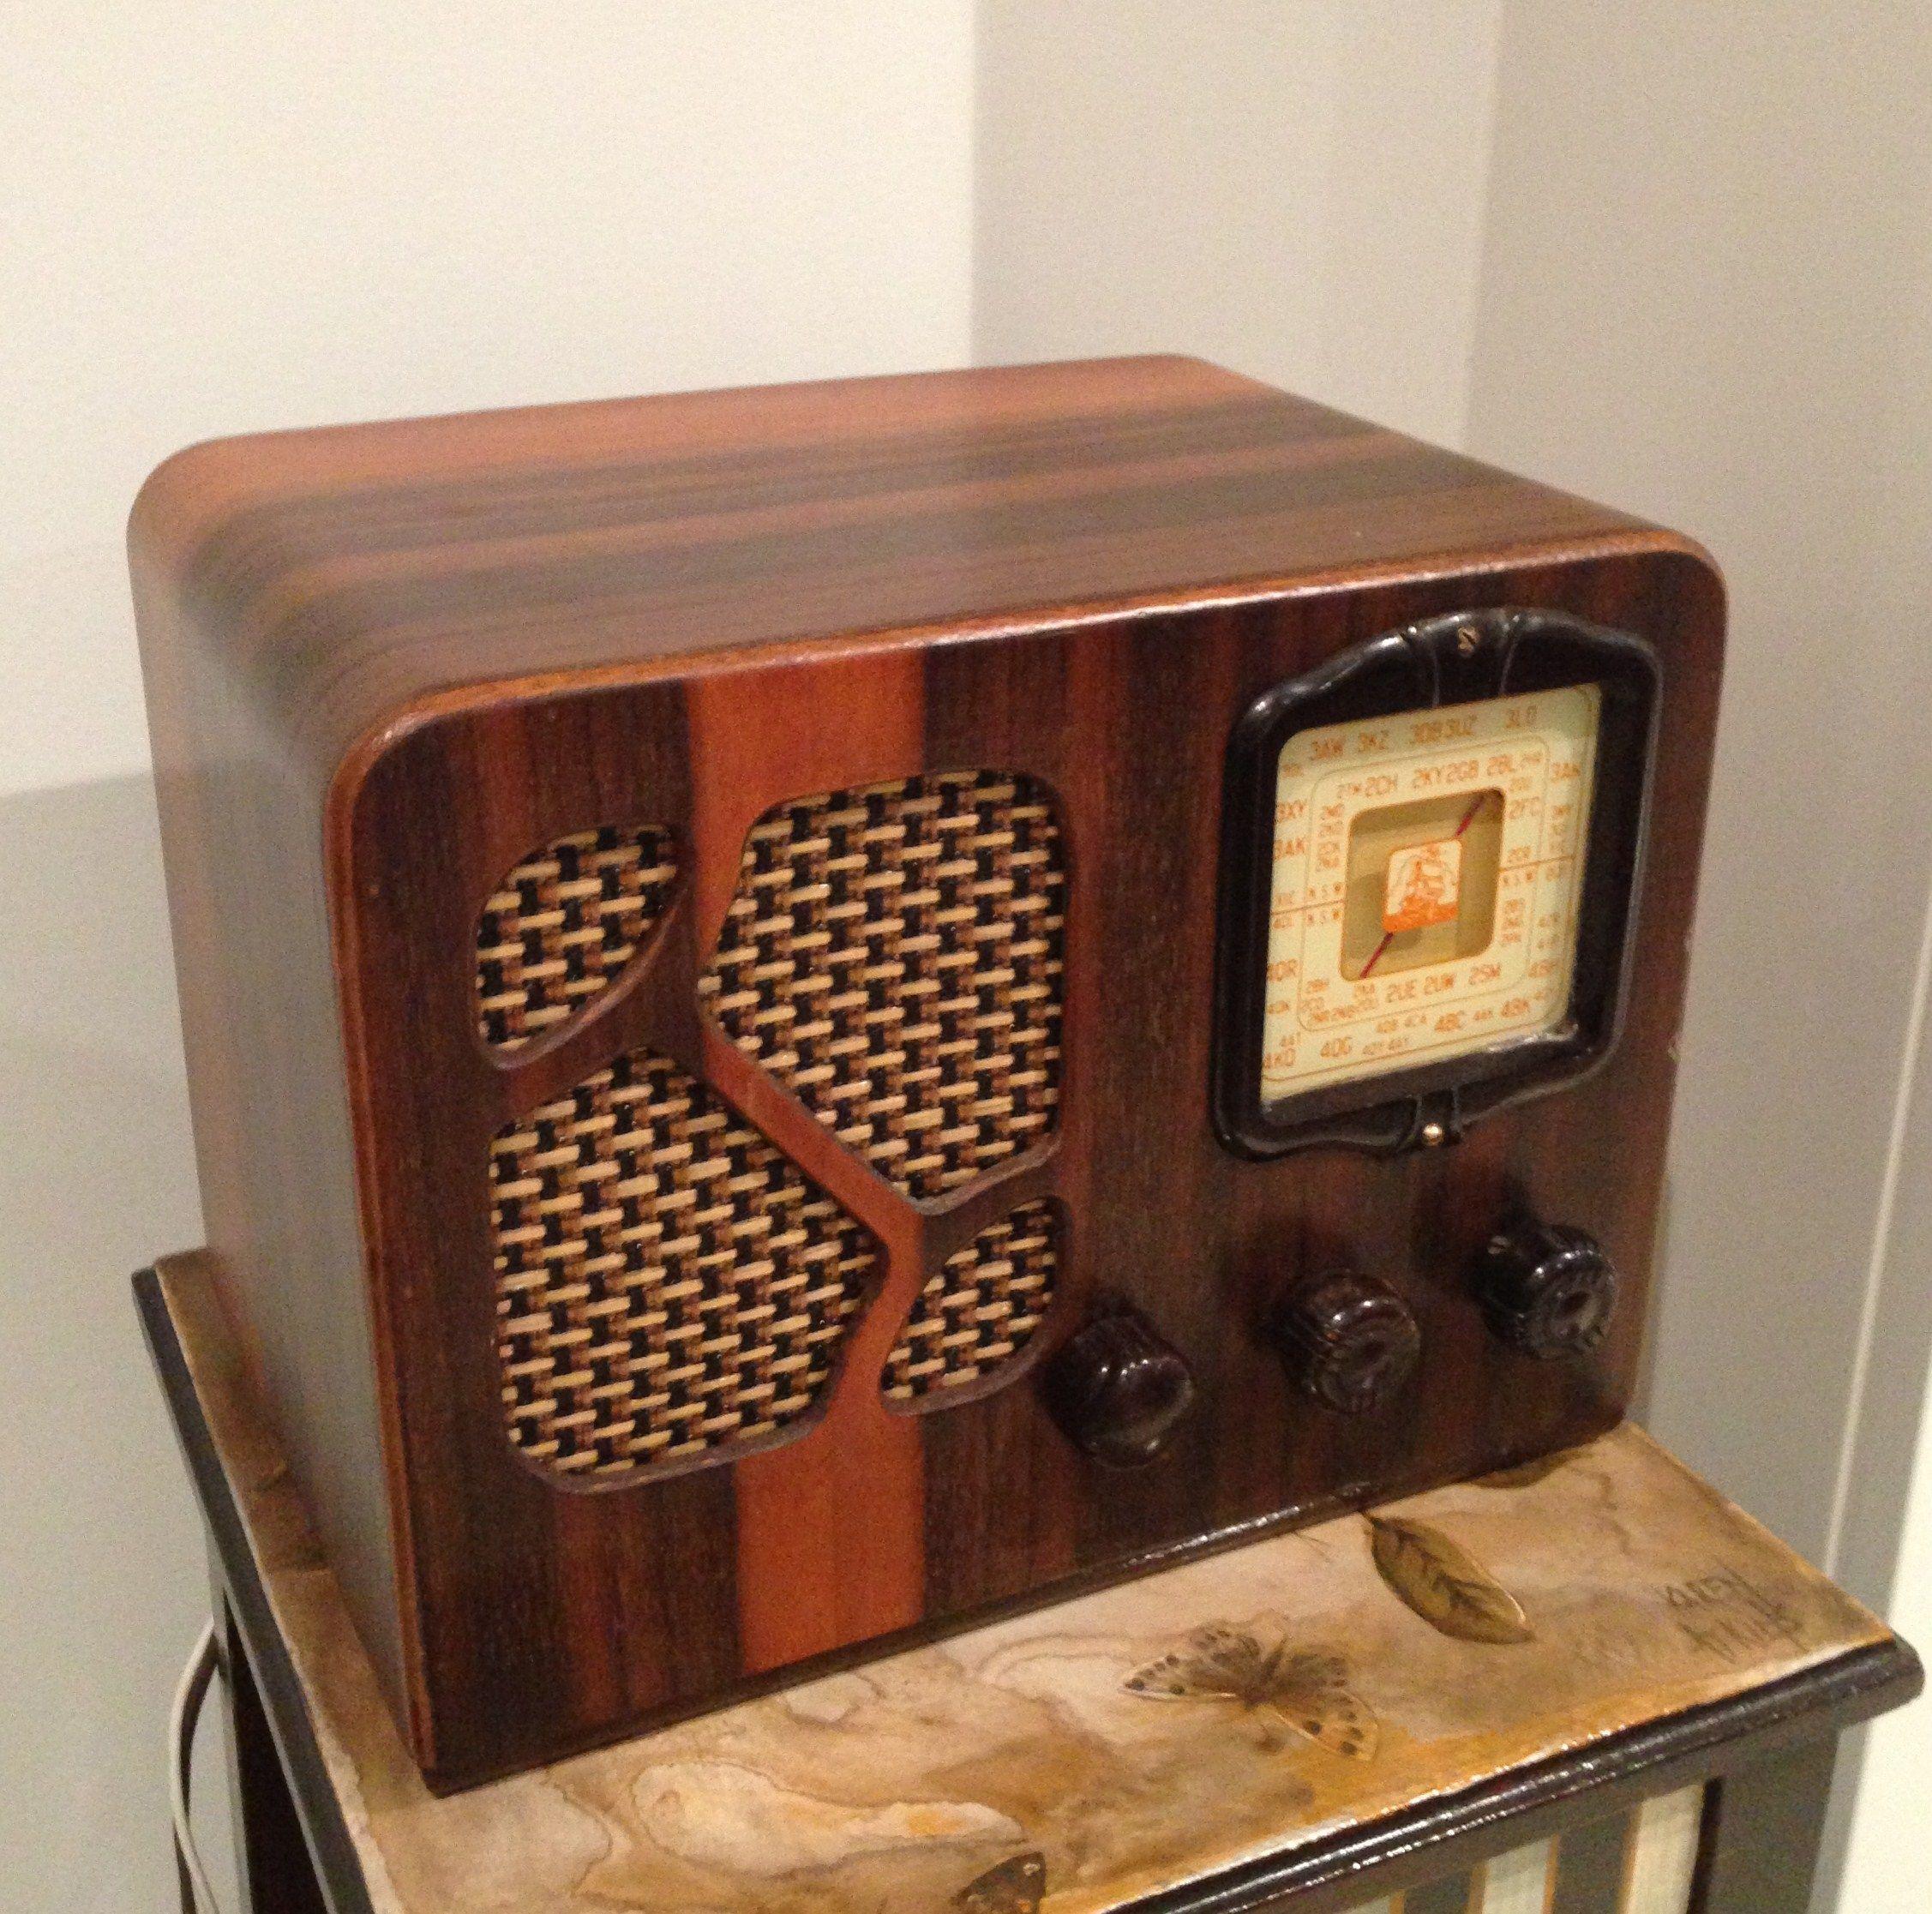 Aegis Valve Radio Australia Circa 1950 Retro Radios Vintage Radio Old Radios